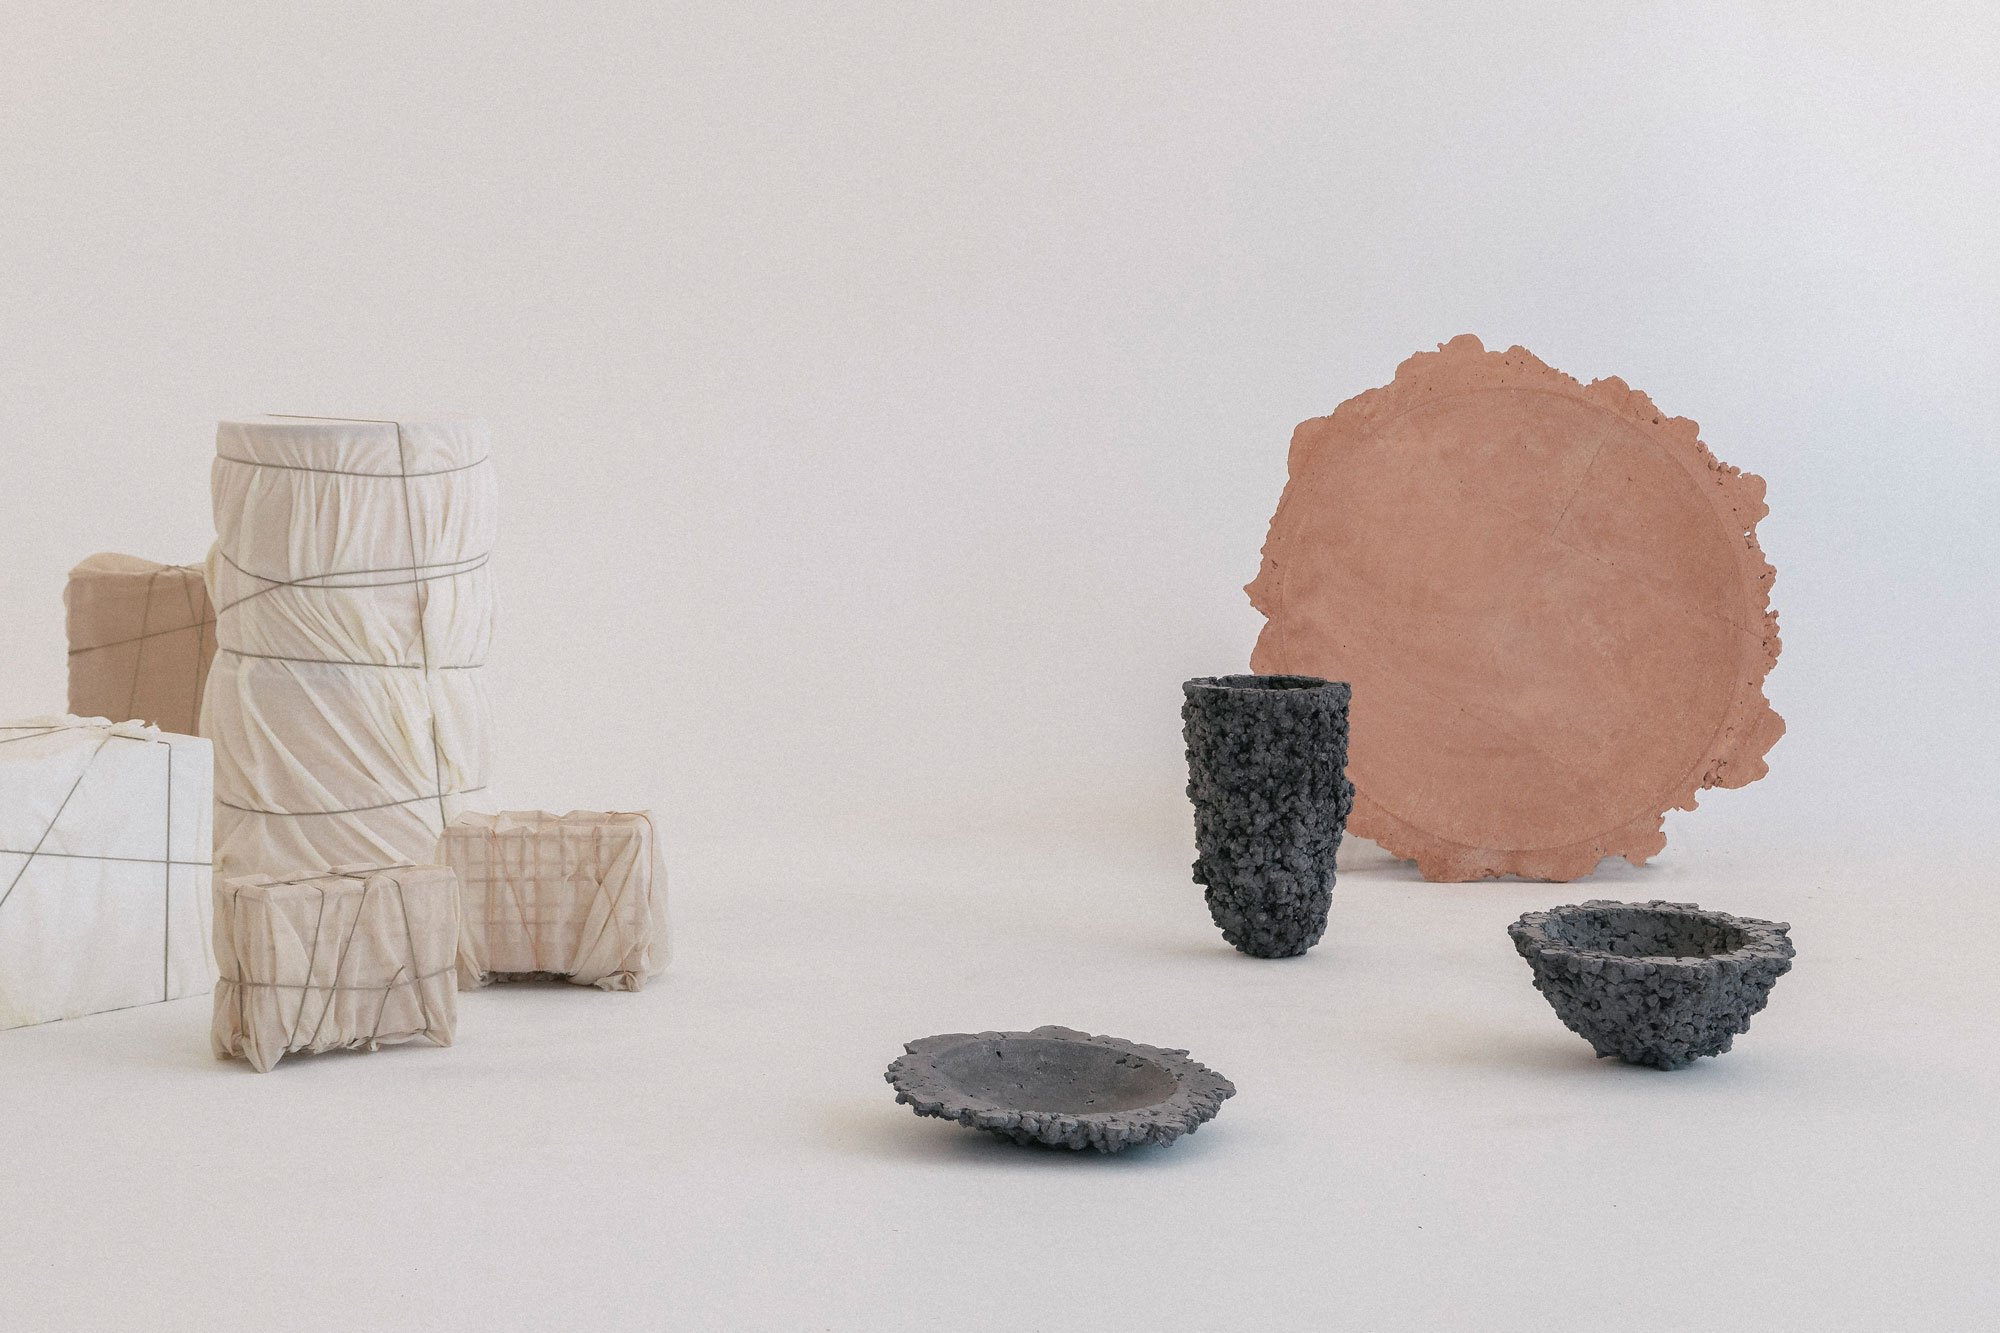 Ukurant Objects, 3daysofdesign 2020, jeunes designers, Davide Ronco